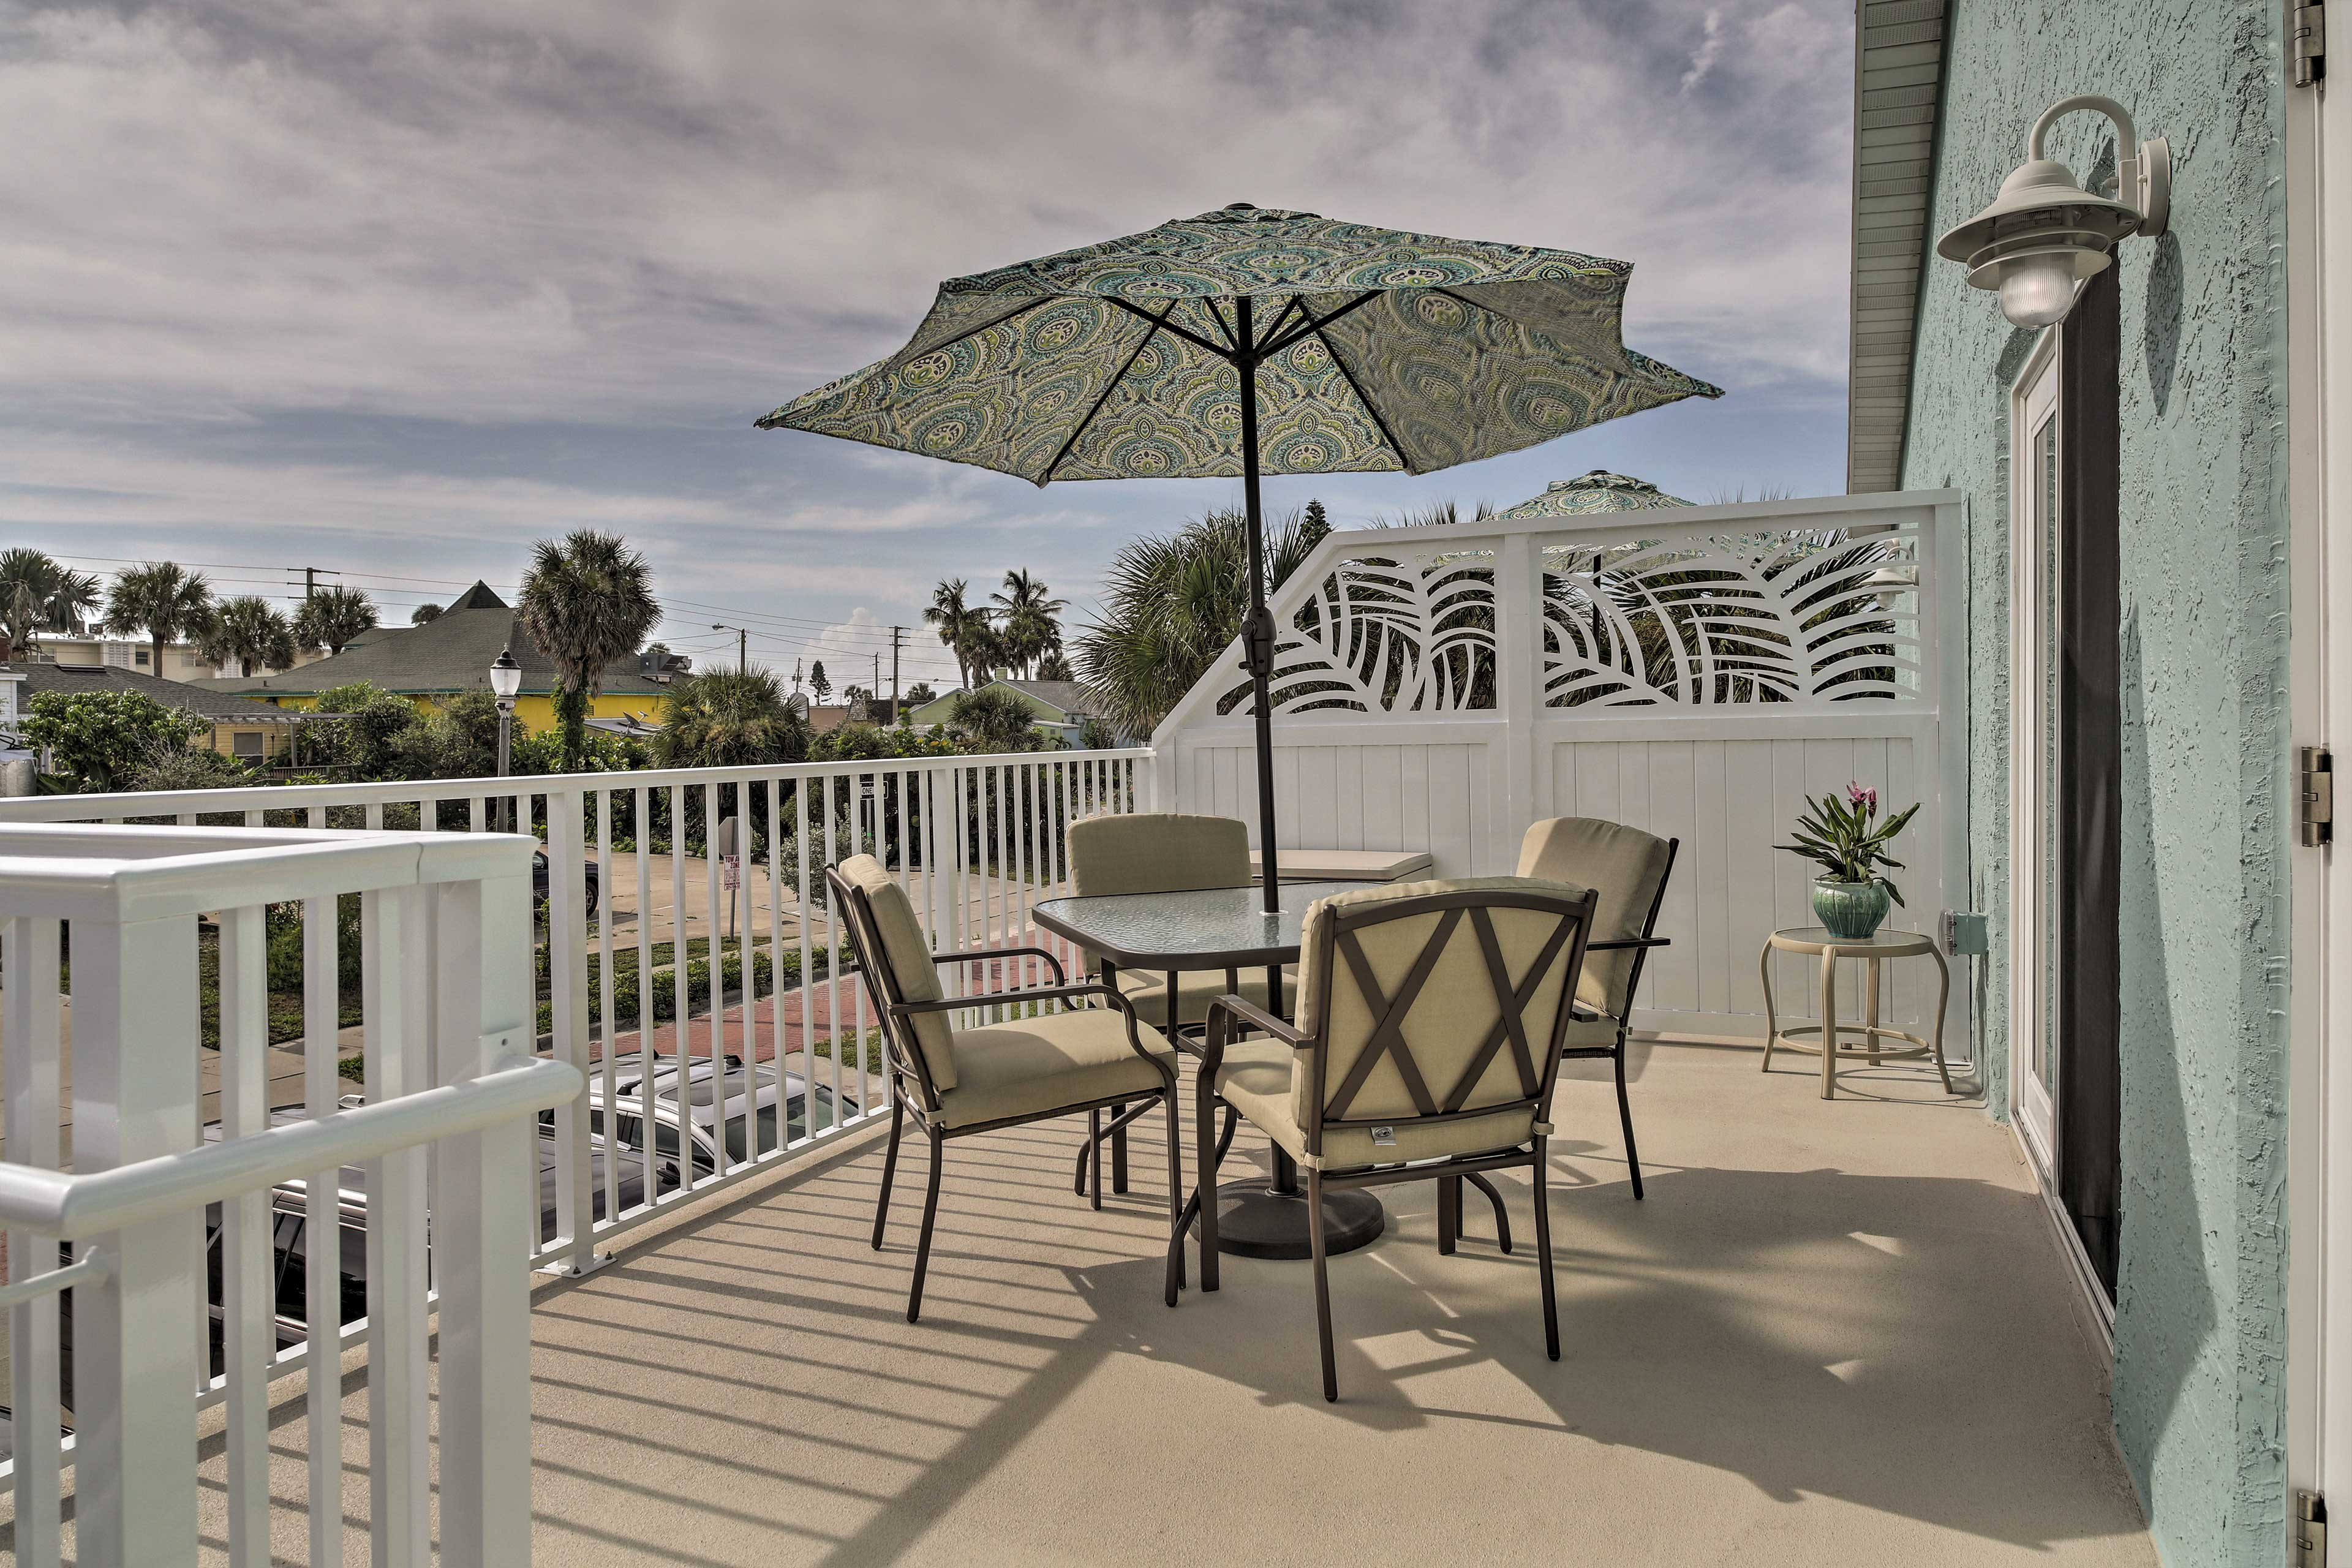 Private Balcony   Outdoor Dining Table   Sun Umbrella